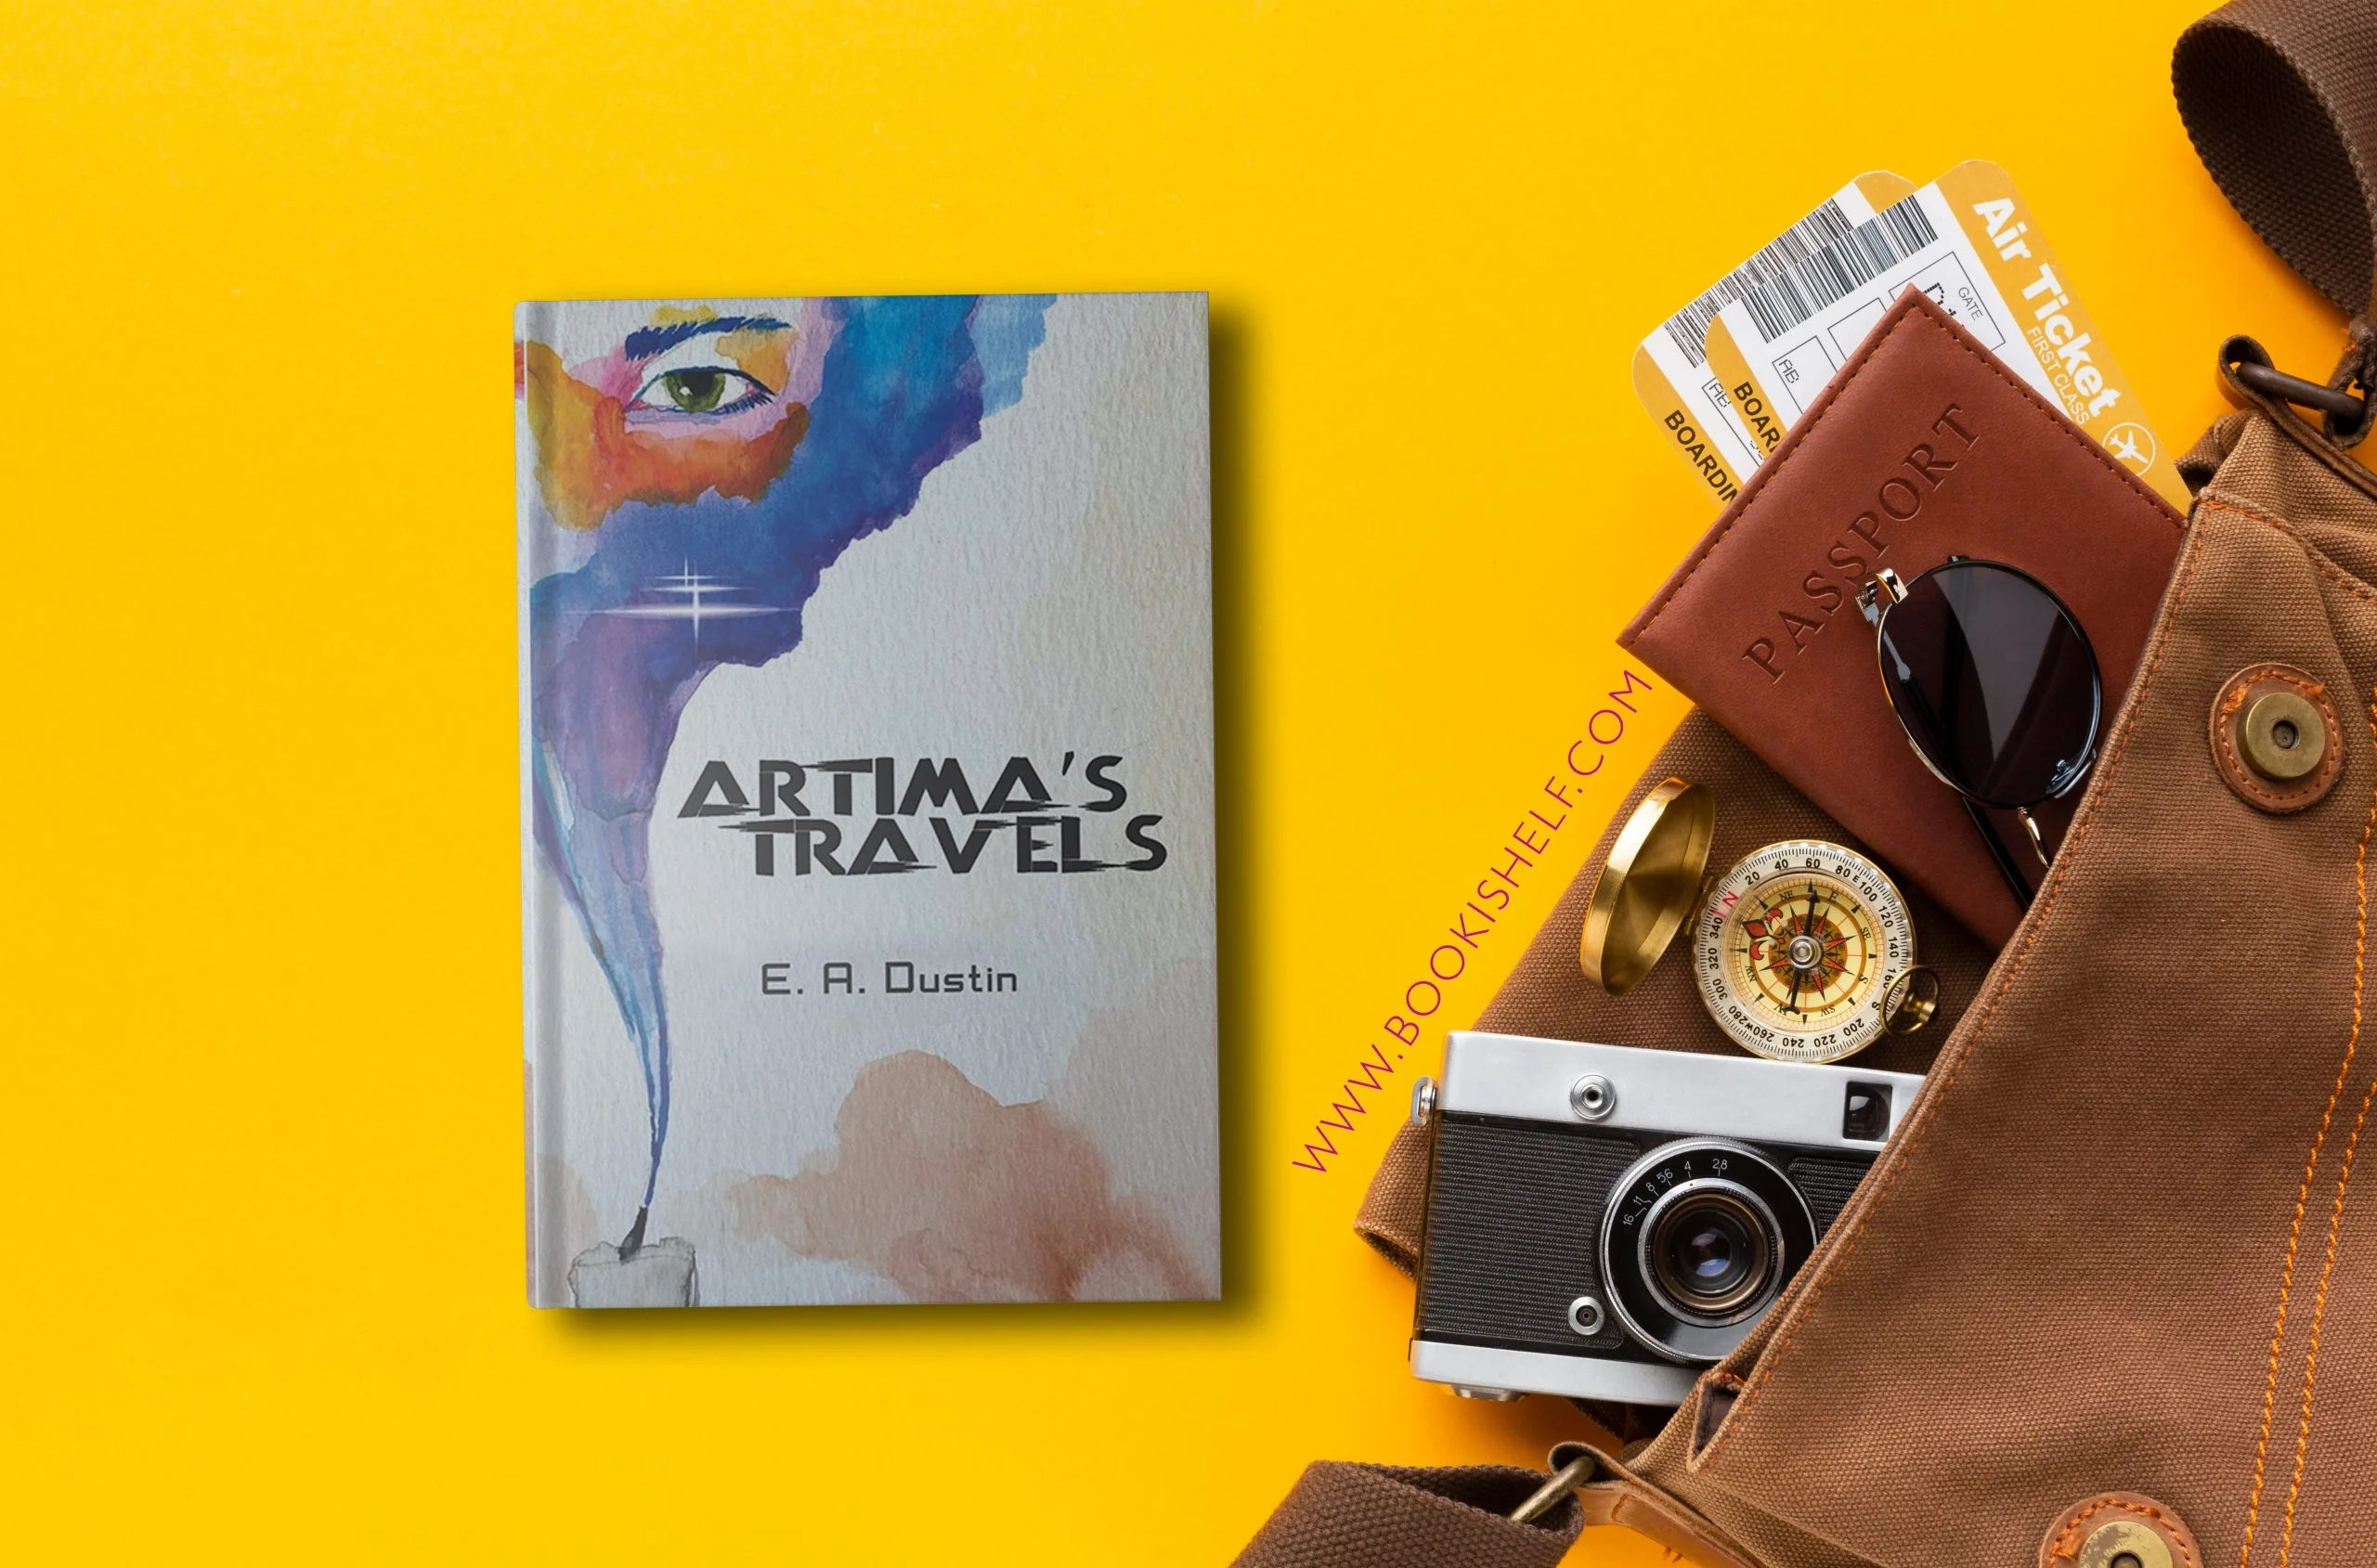 Artima's Travels by E A Dustin -